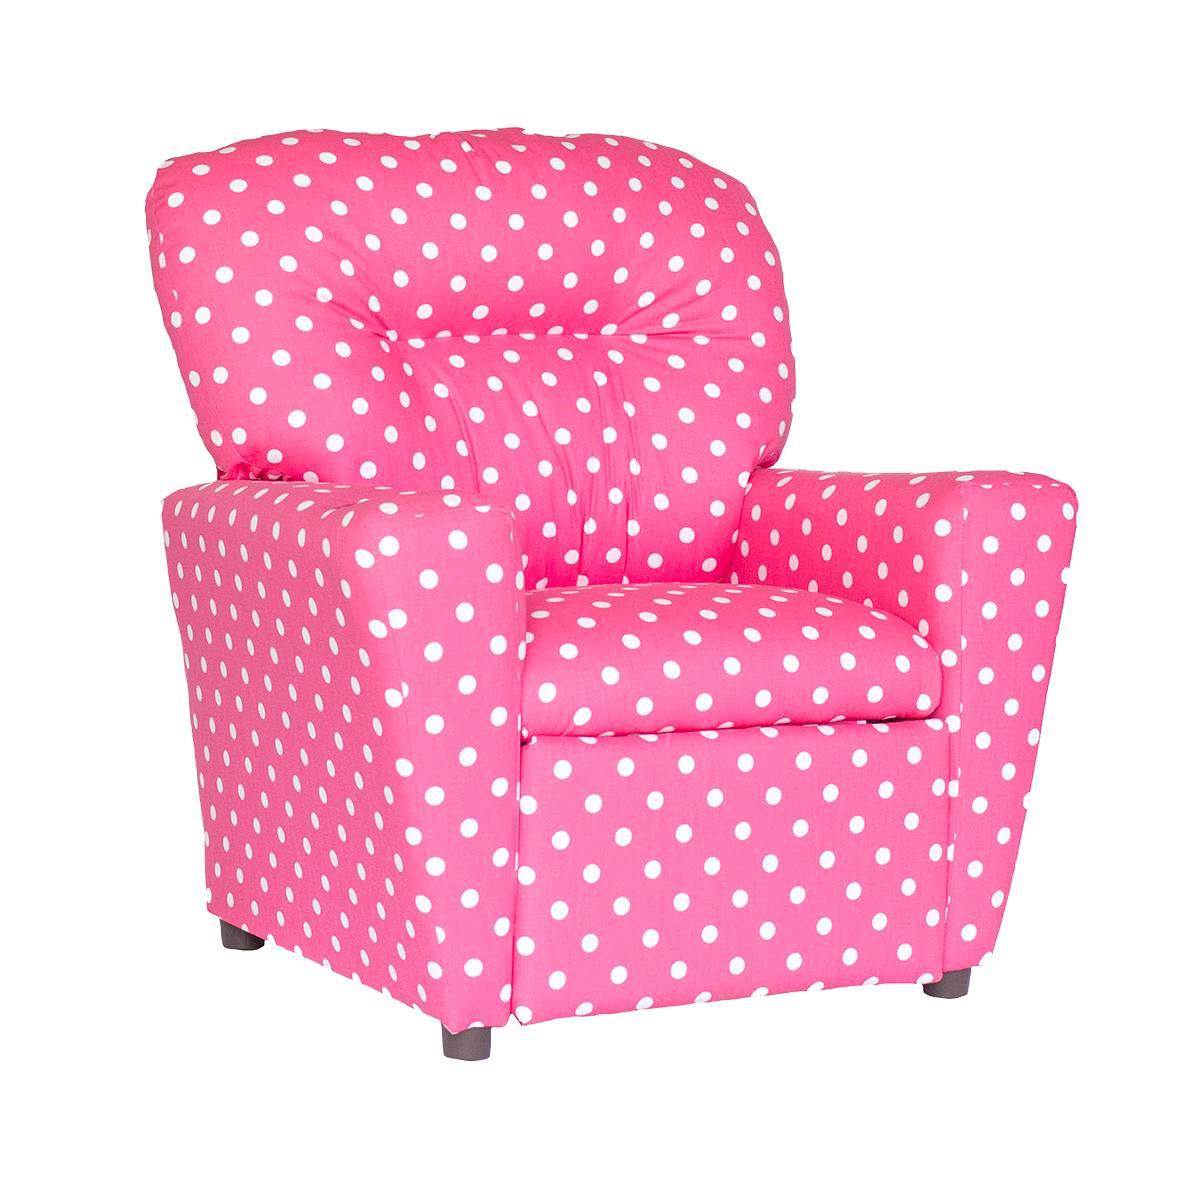 #TW800R Polka Dot Candy Pink